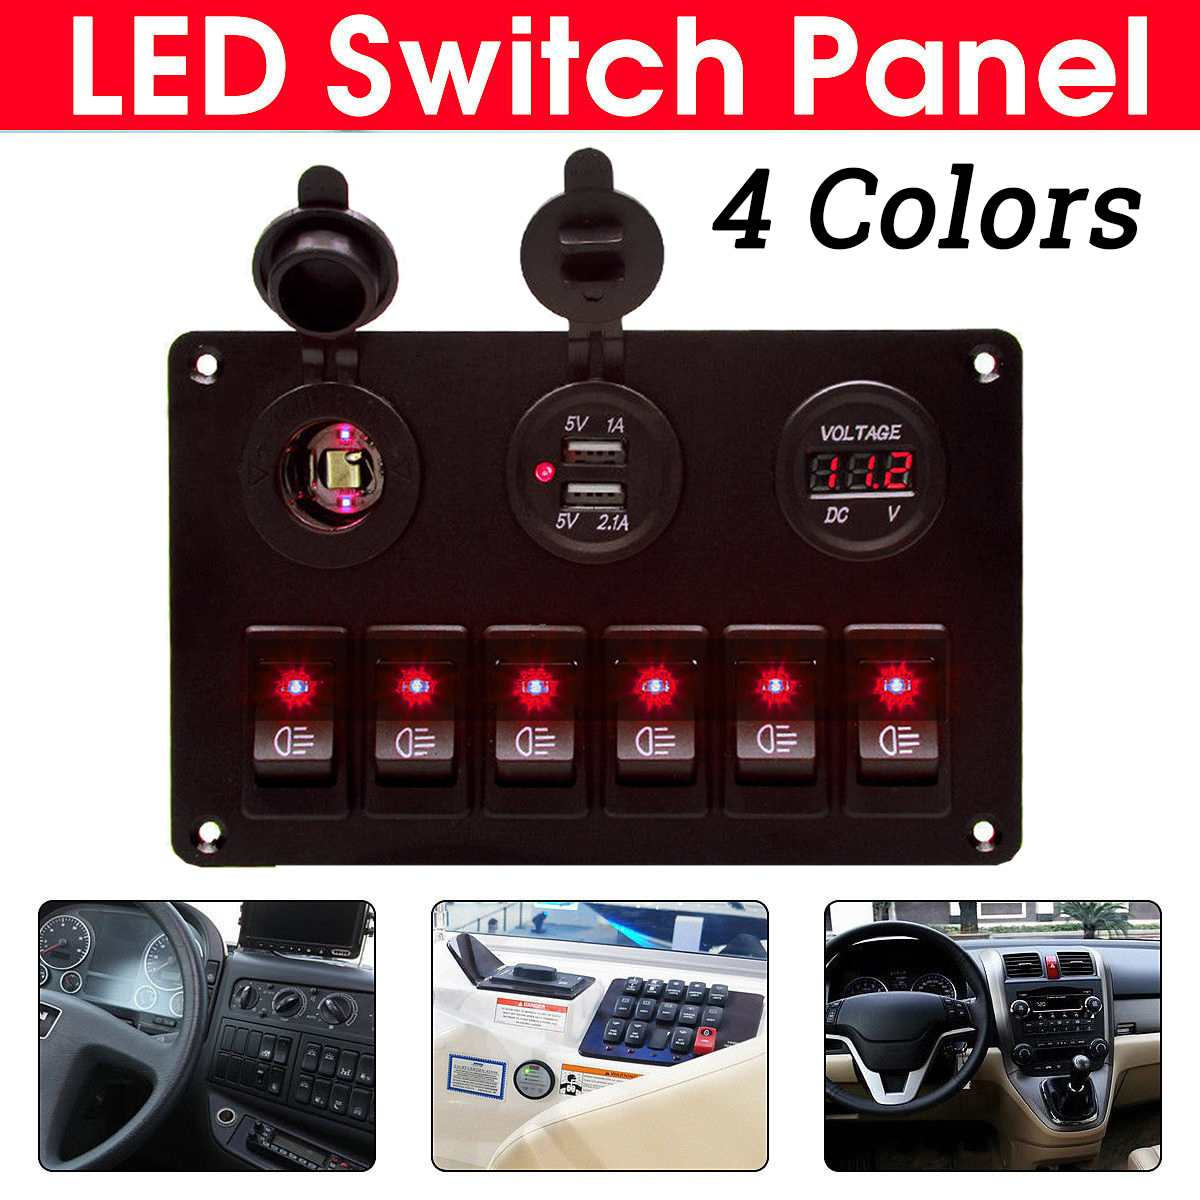 6 Gang Rocker Switch Panel Led Display Voltage Dual USB Charging Ports Switch Universal for 12V 24V Car Yacht Boat Caravan